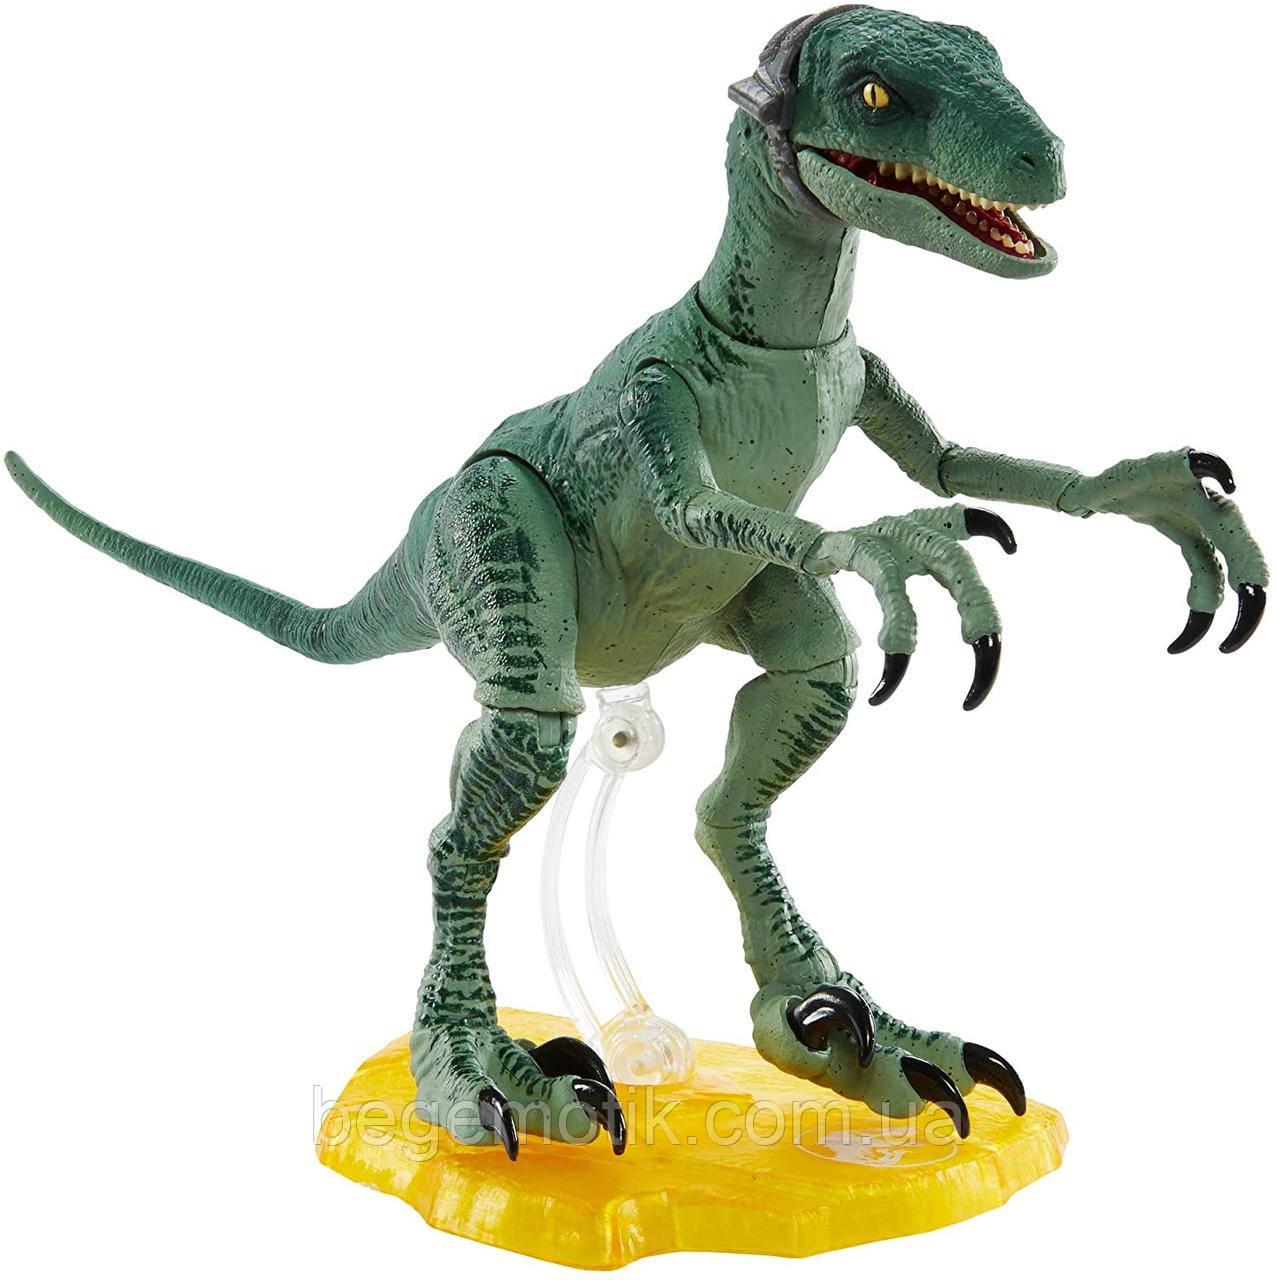 Jurassic World Динозавр Велоцераптор Юрский мир Jurassic World Amber Collection Velociraptor Delta